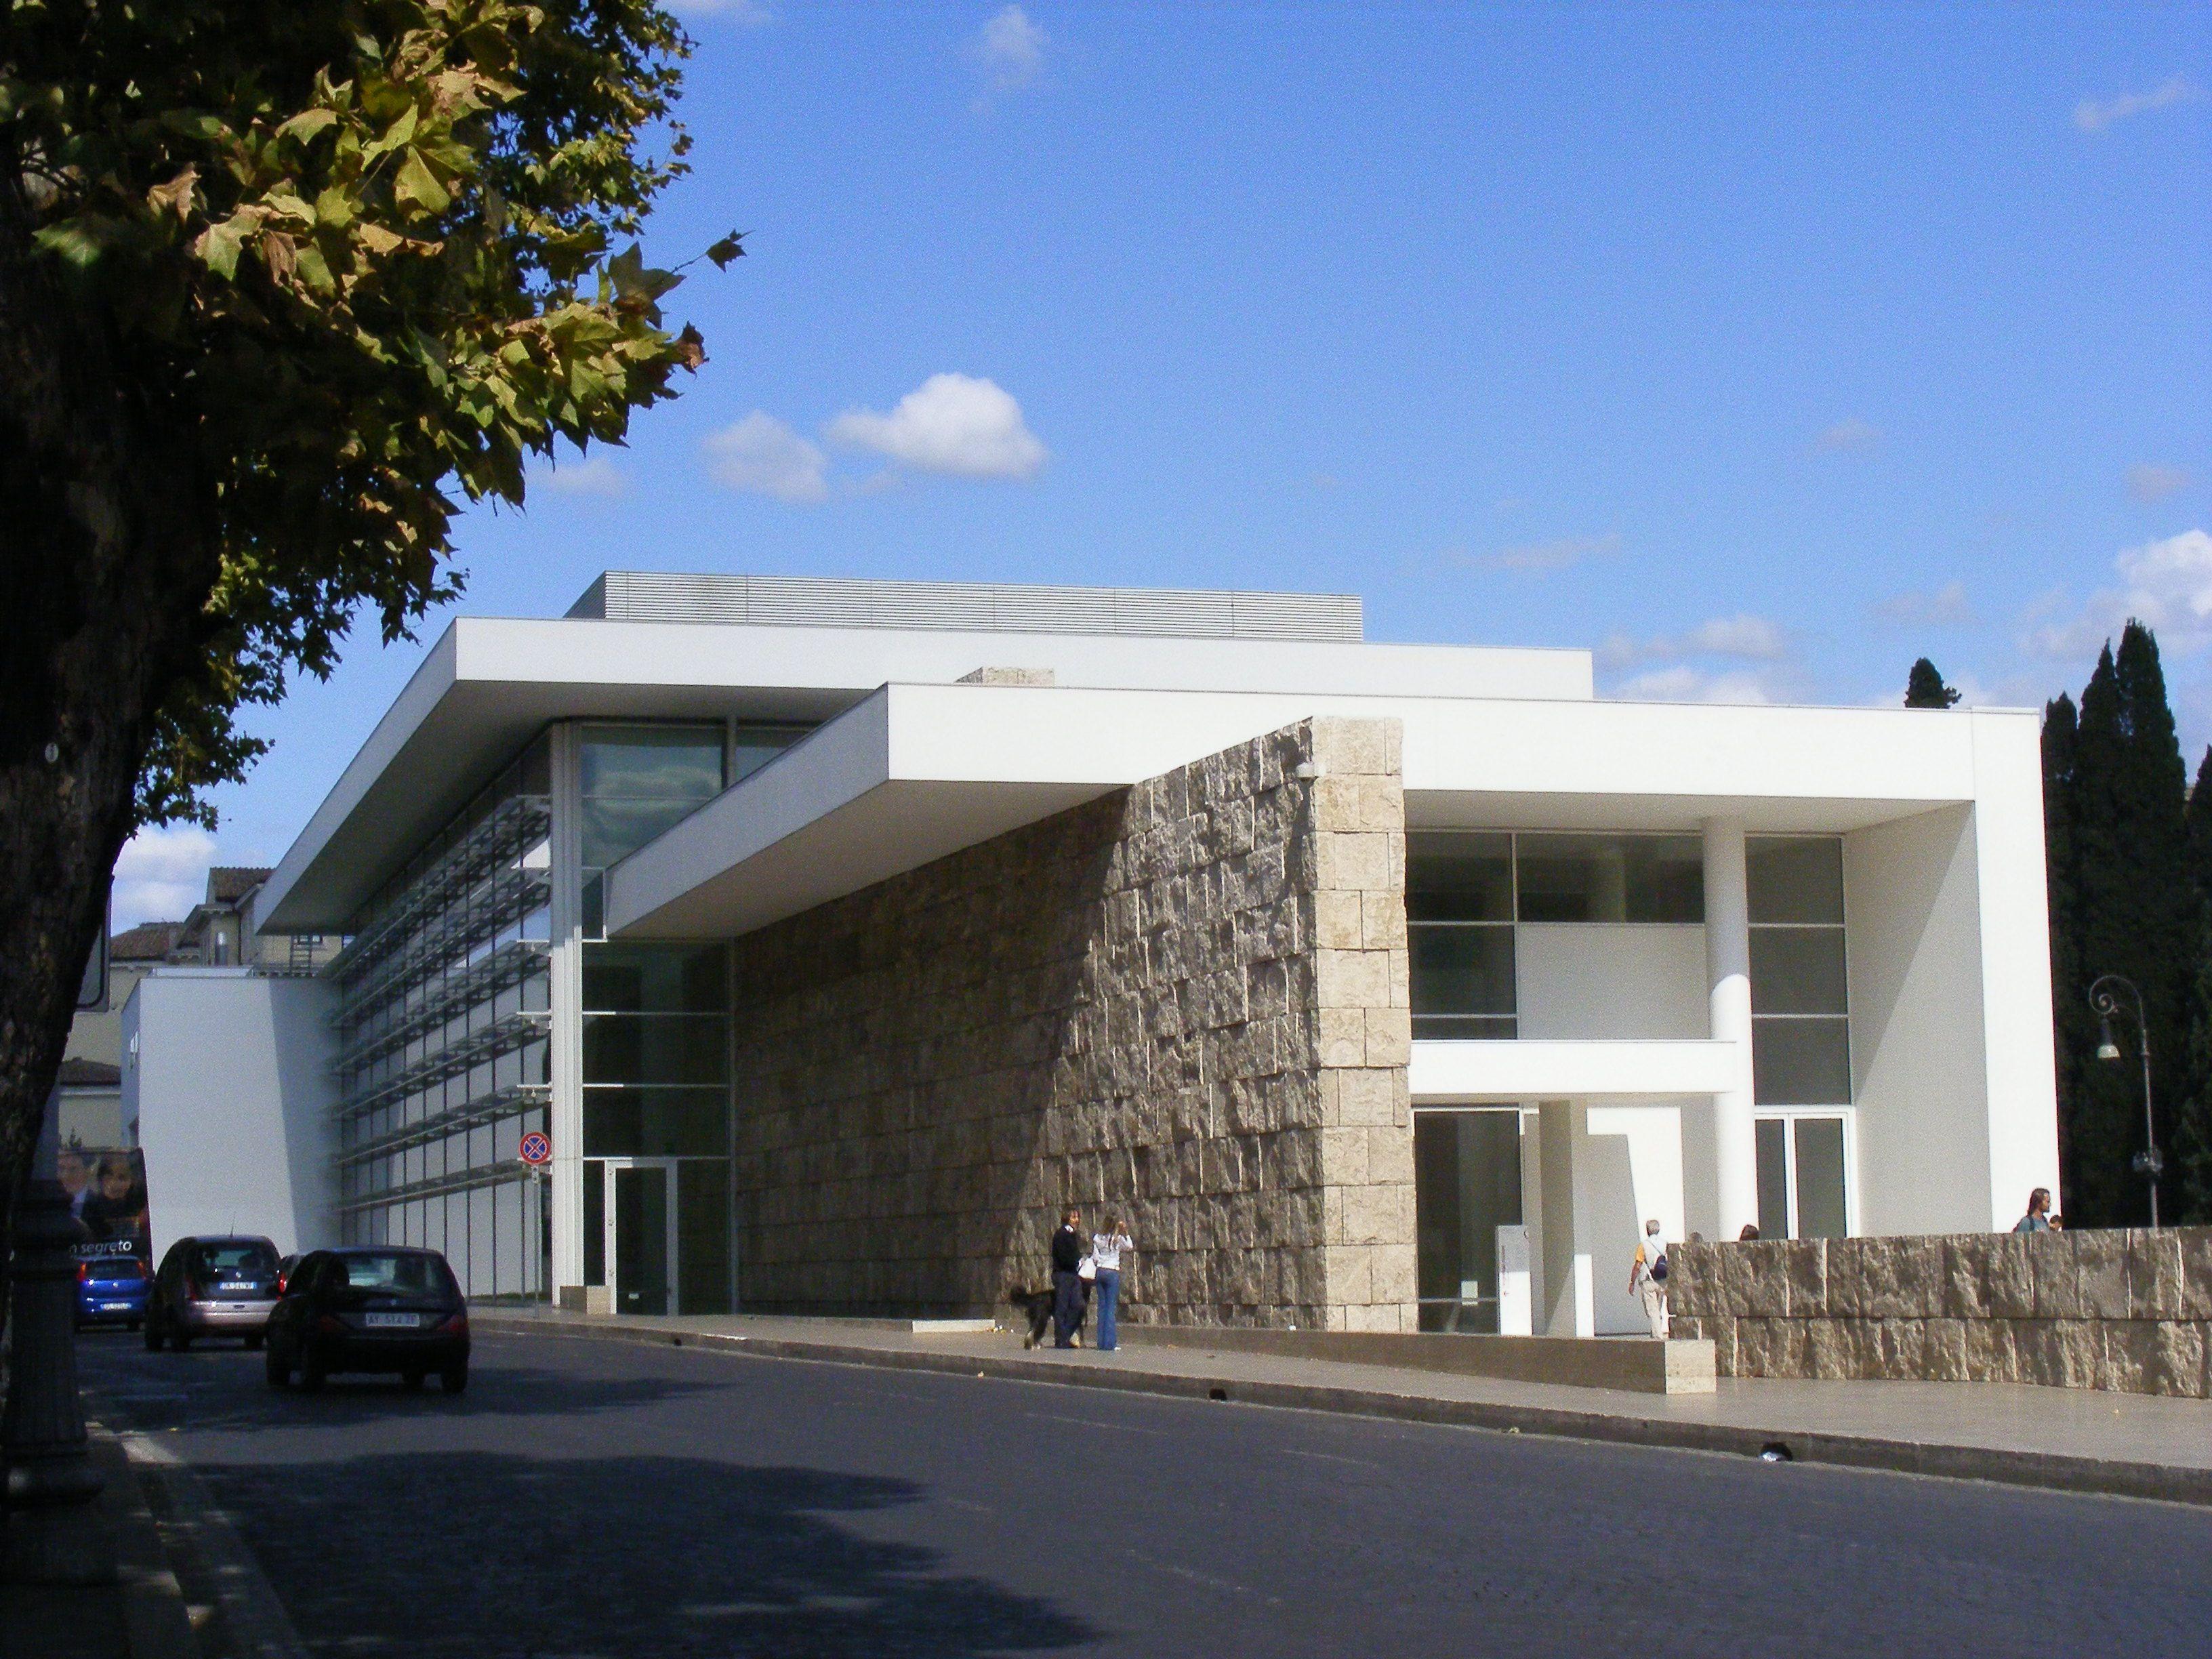 Ara Pacis Museum Rome Richard Meier Architecture Modern Architecture Richard Meier